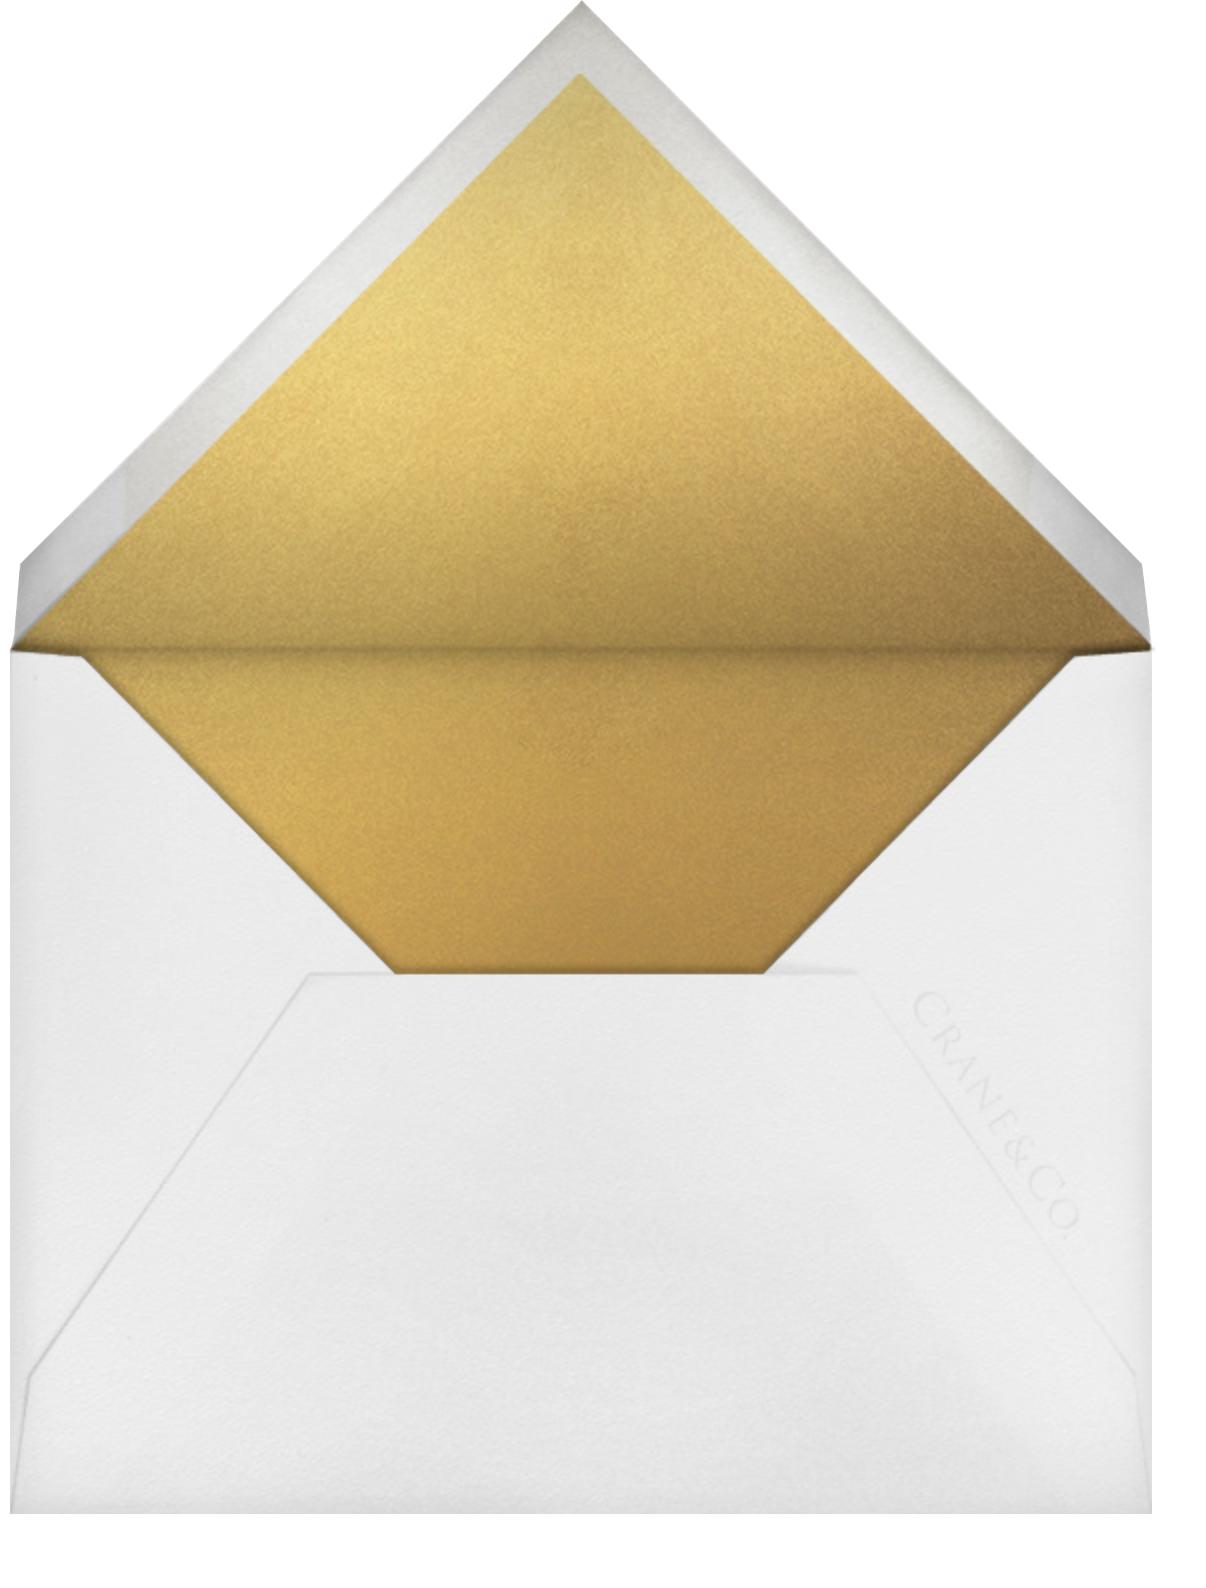 Ledger - Gold - Vera Wang - Bat and bar mitzvah - envelope back